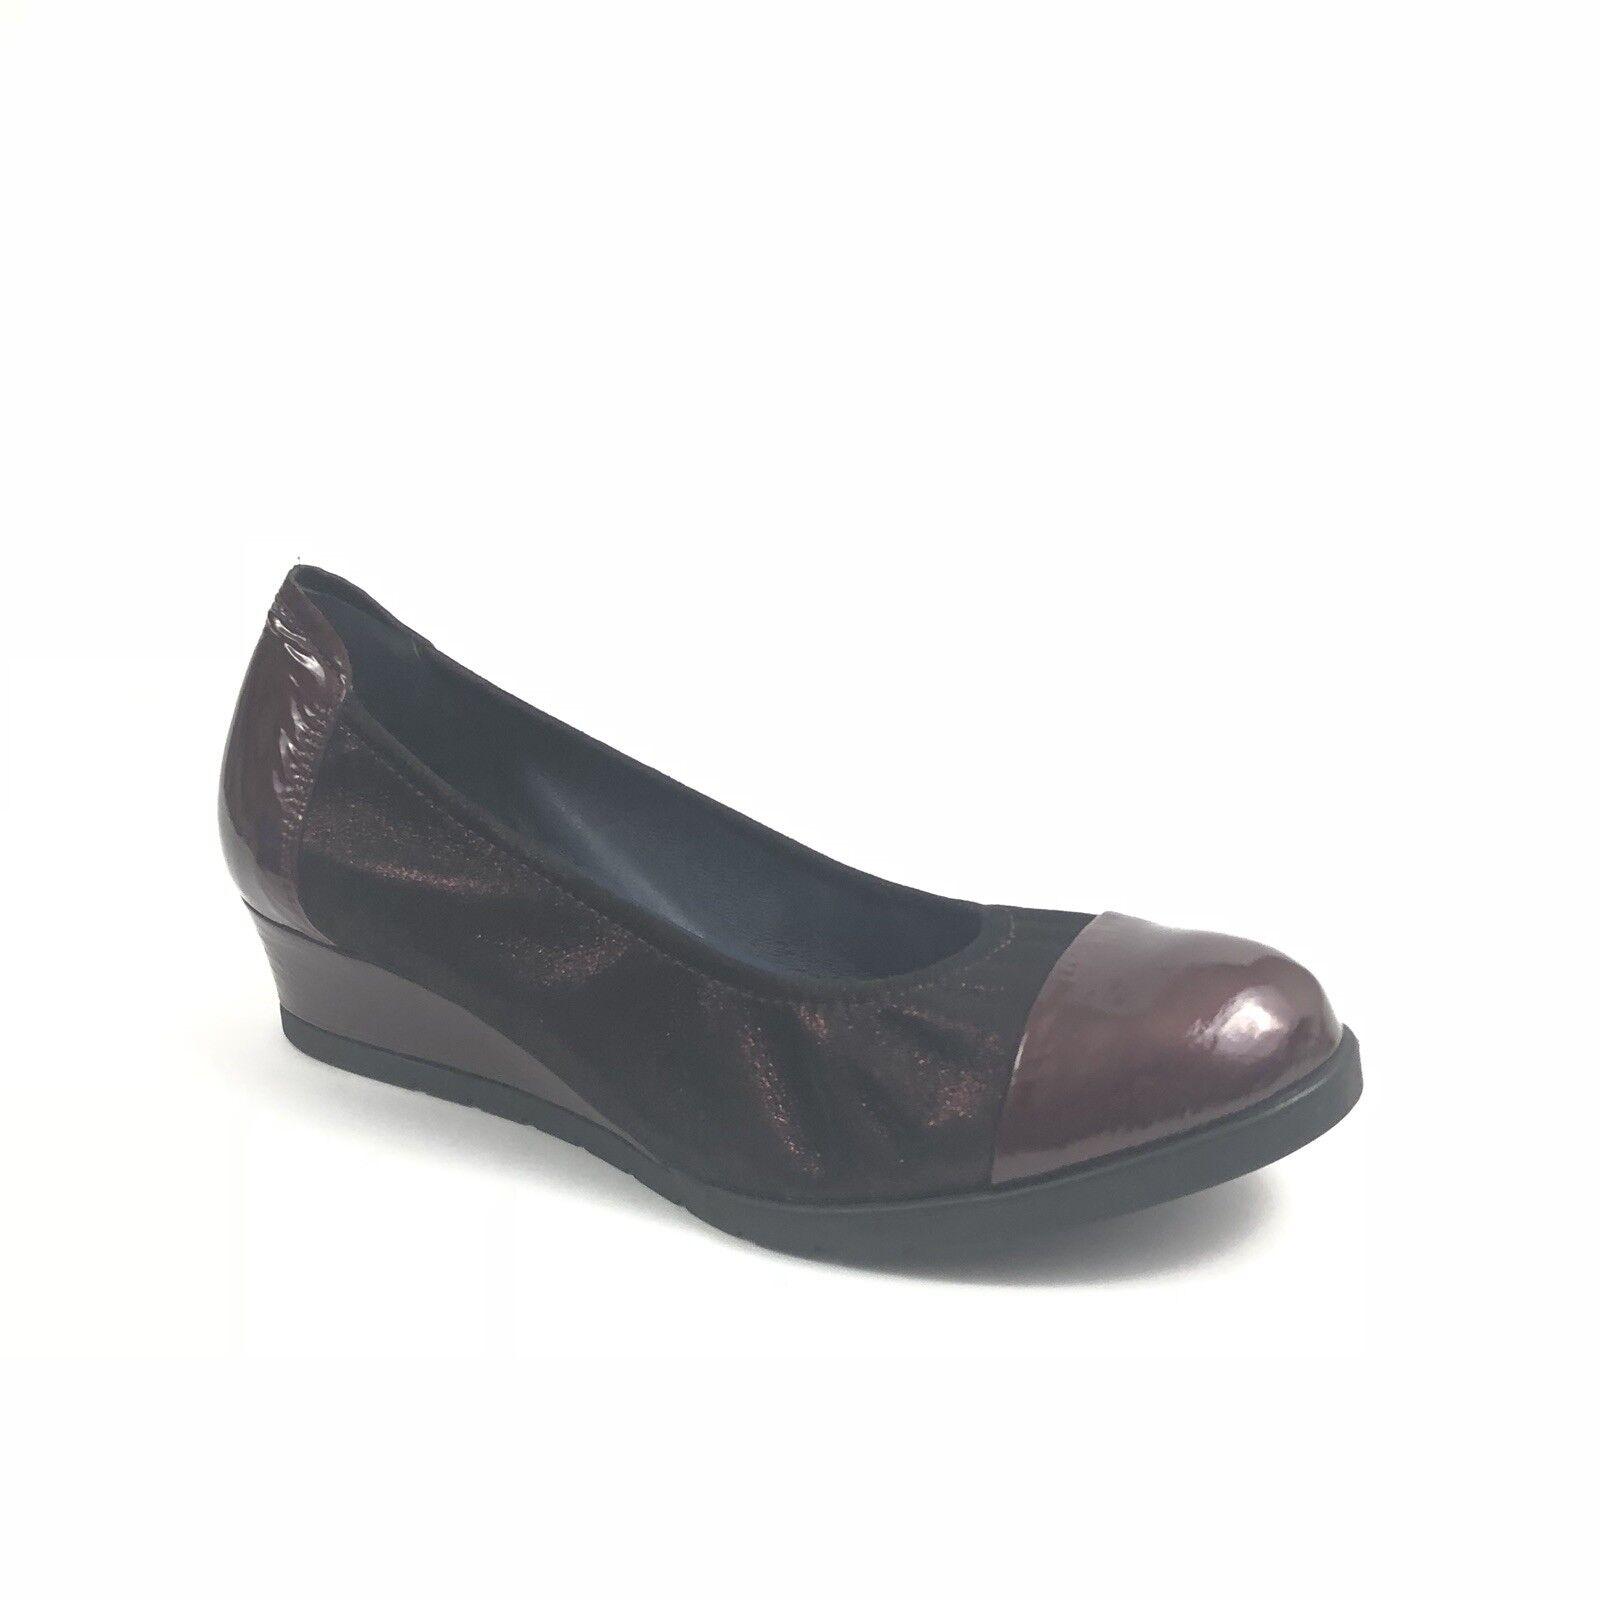 migliori prezzi e stili più freschi Sabrinas London donna donna donna Dimensione 37 Metallic Patent Leather Cap Toe Heel Wedges  fantastica qualità